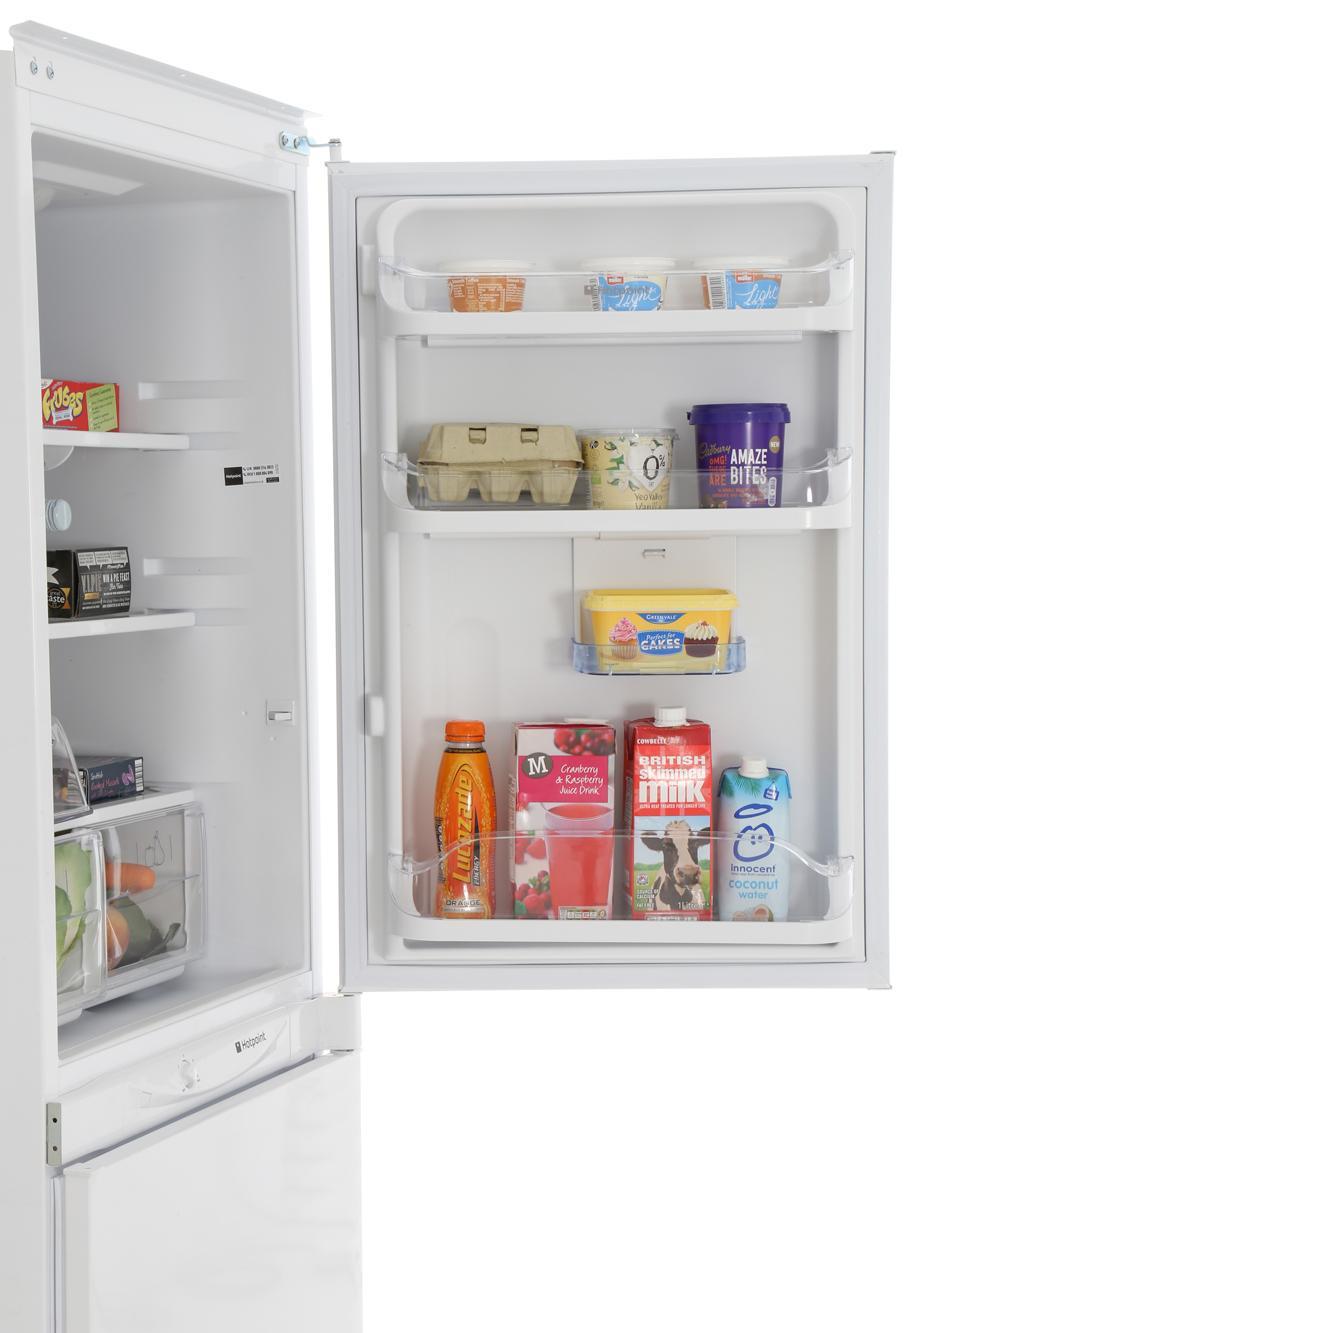 Buy Hotpoint Hm325ff2 Integrated Fridge Freezer White